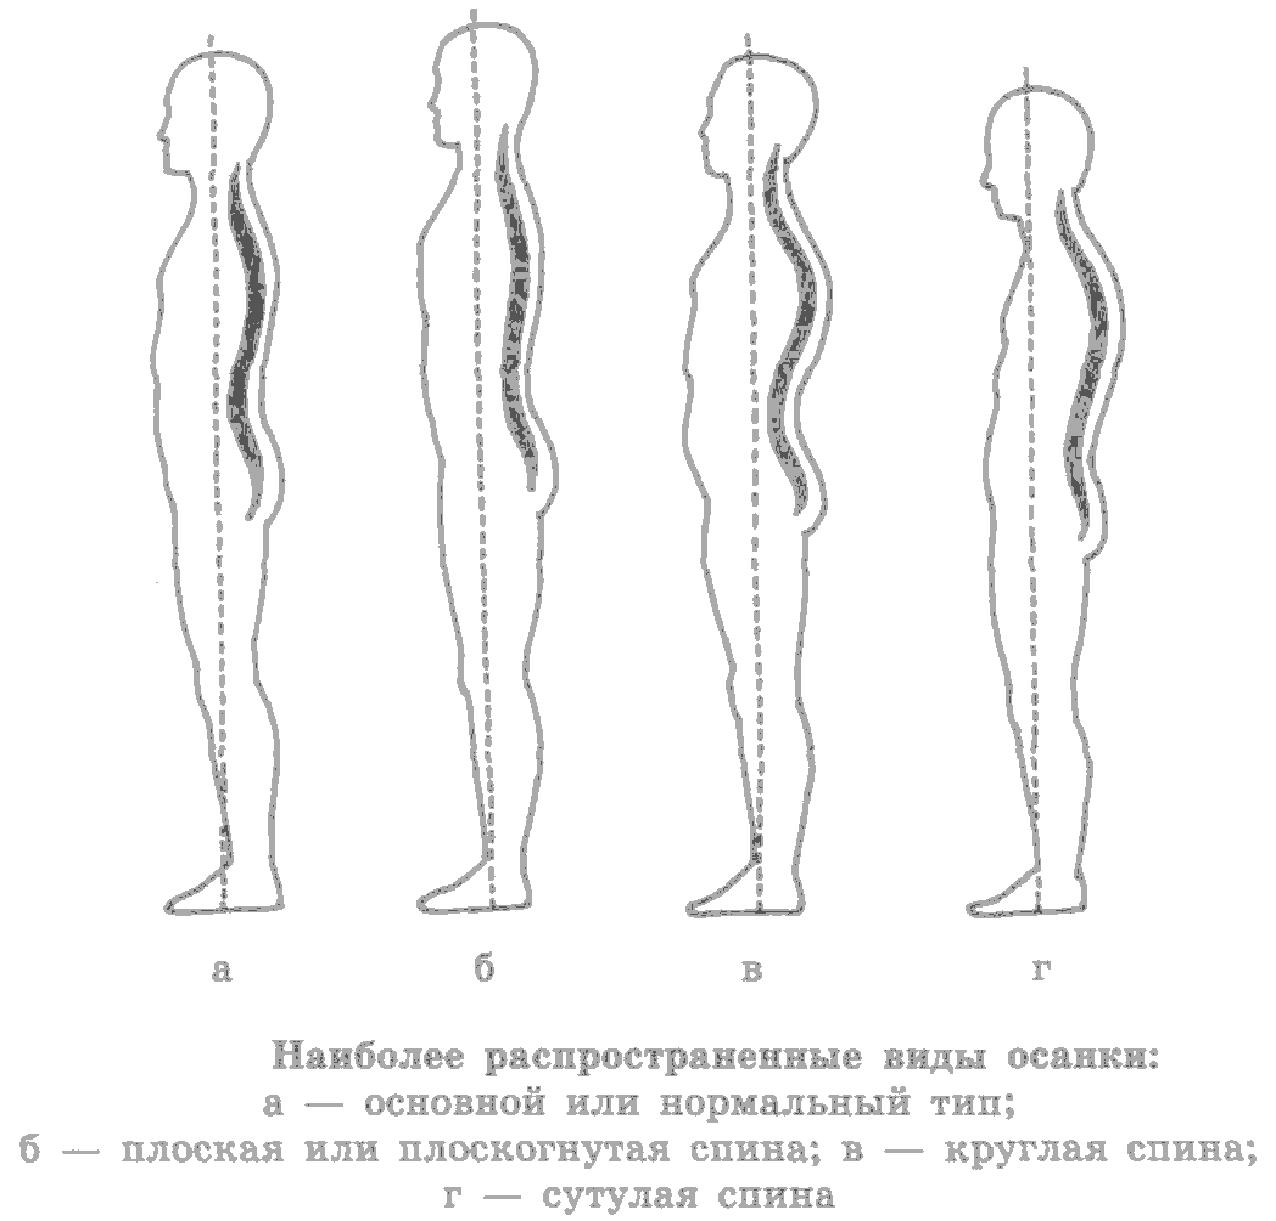 Презентация по профилактике нарушения осанки и плоскостопия в доу